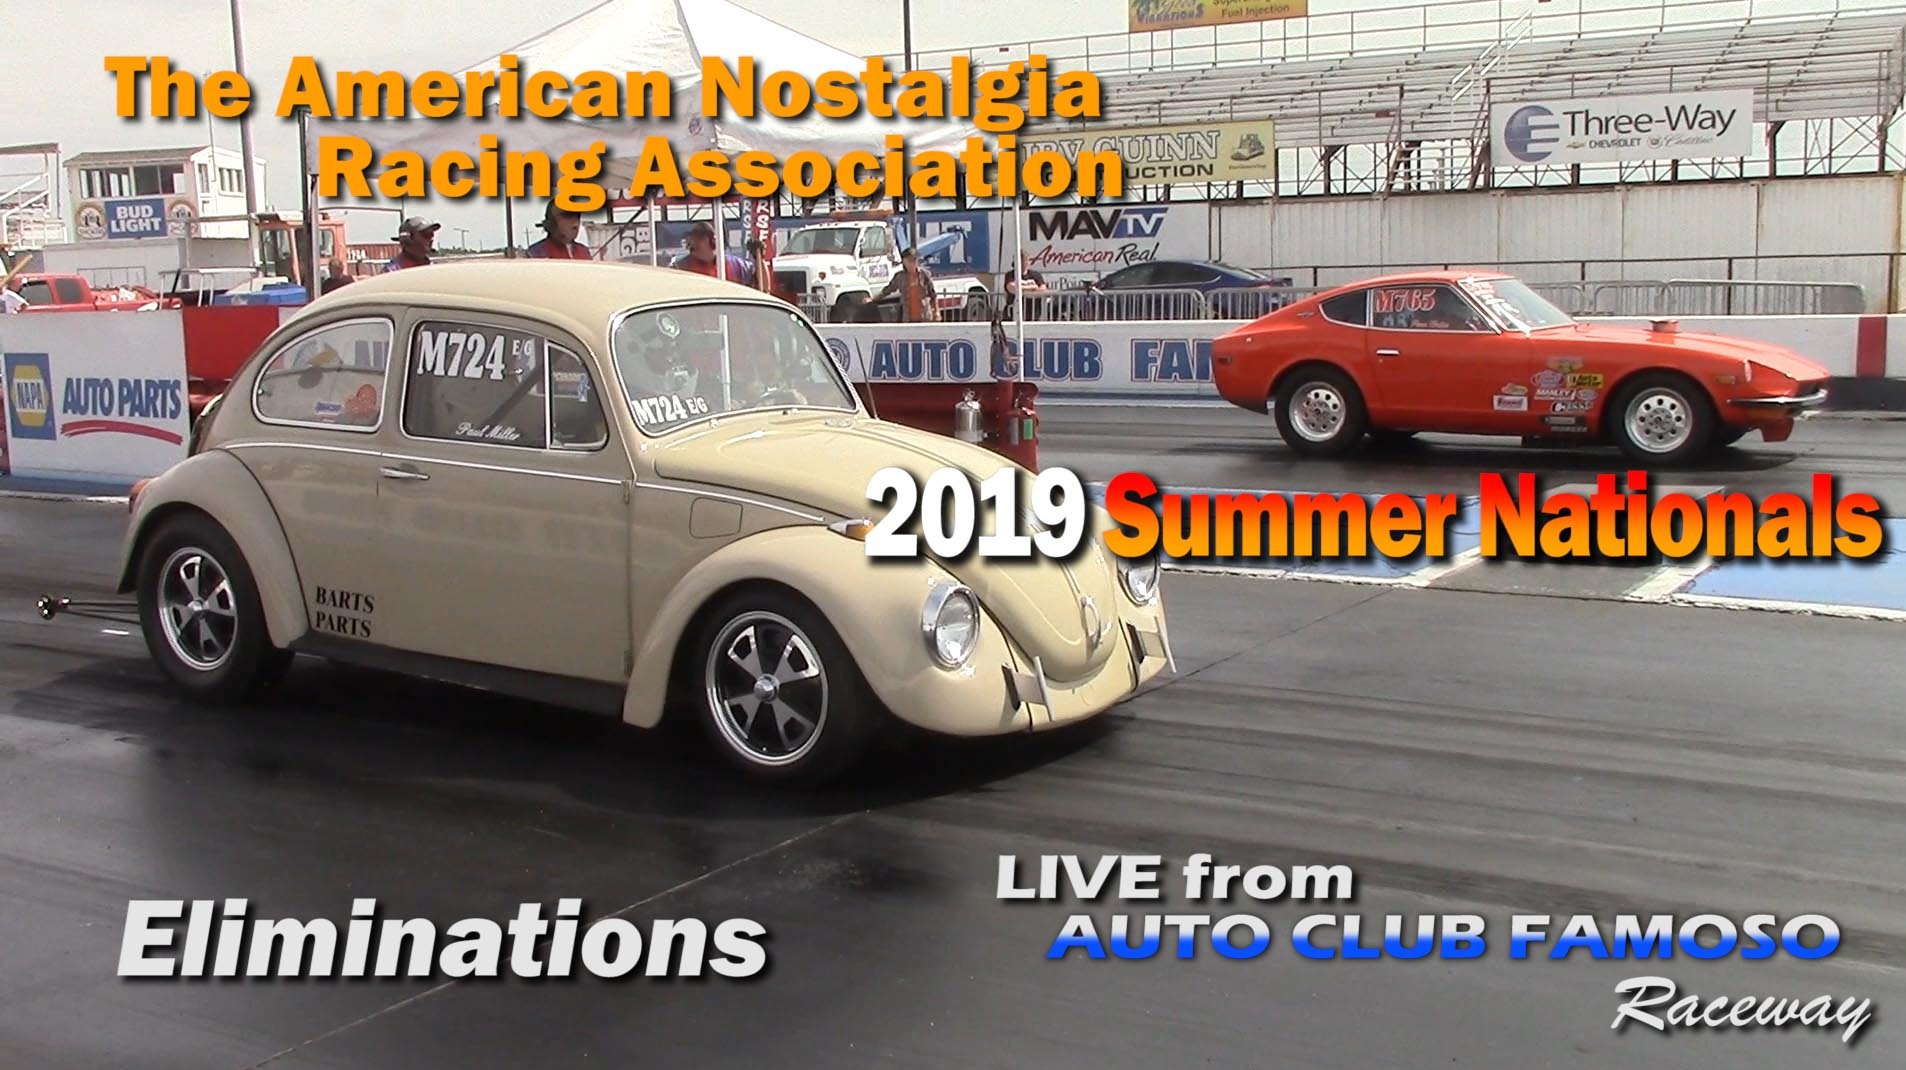 ANRA 2019 Summer Nationals Eliminations on Livestream